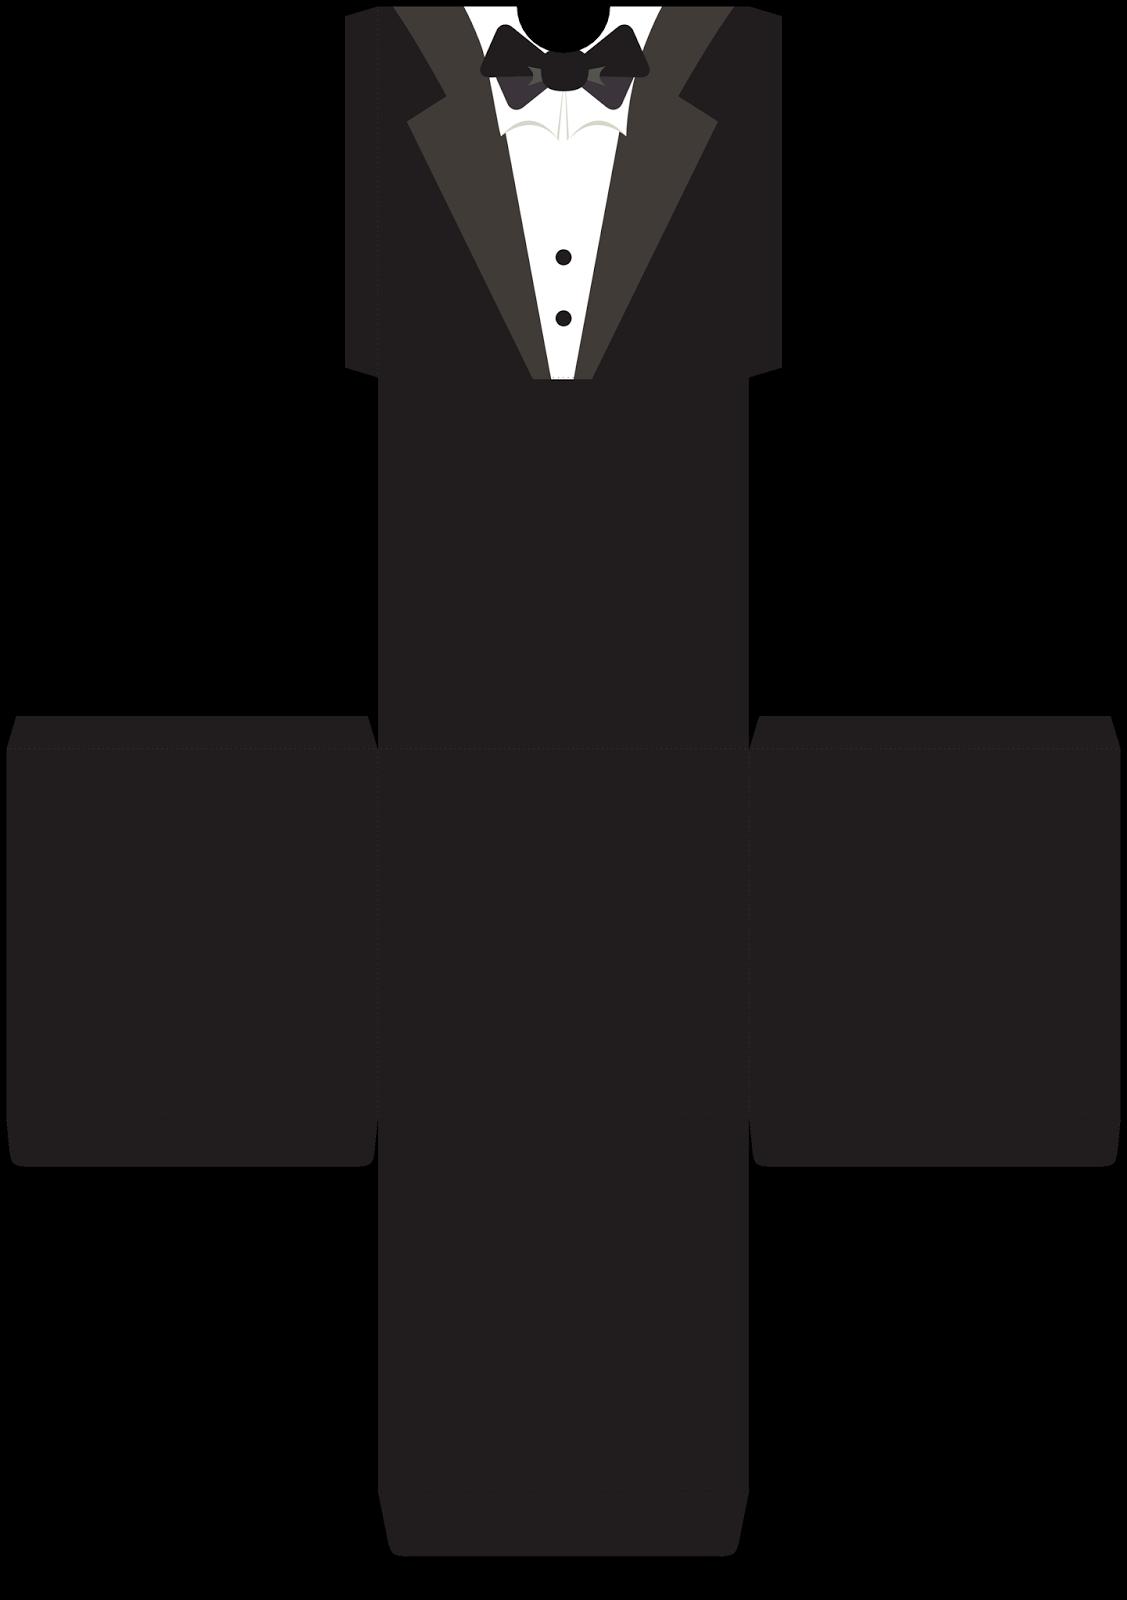 Onesie clipart tuxedo. Cajas abiertas para bodas